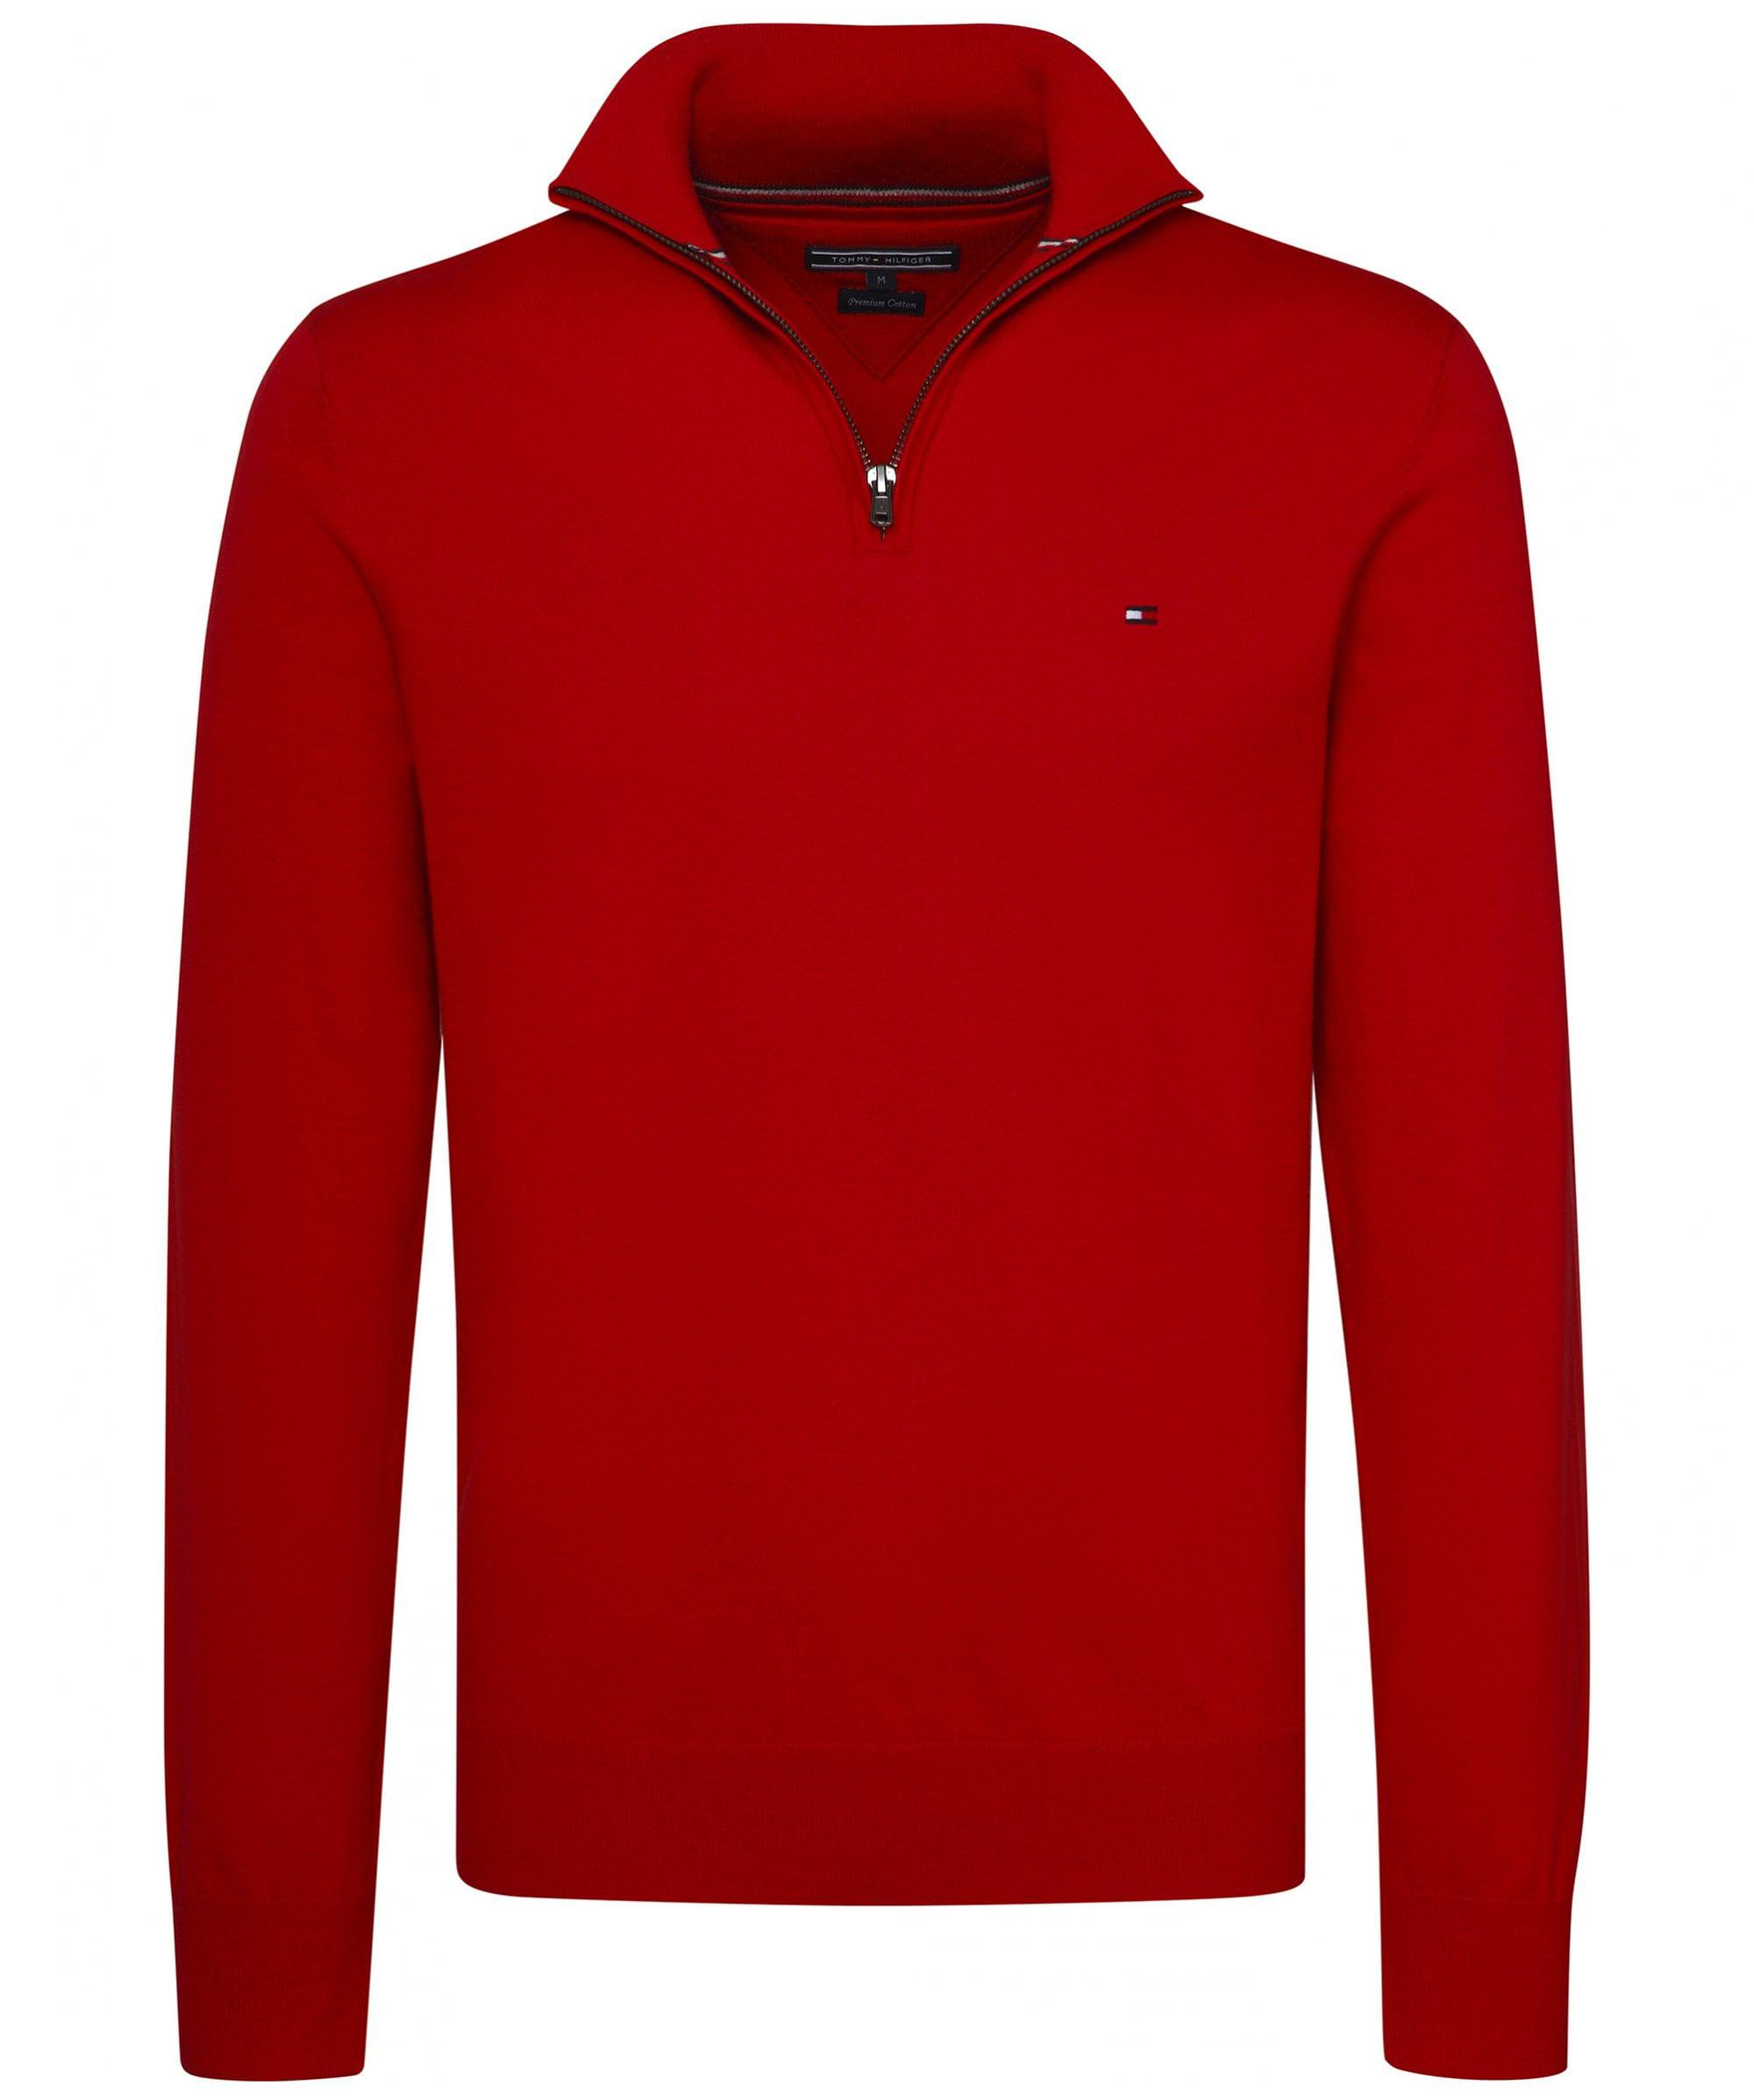 d0f6714765d9 Lyst - Tommy Hilfiger Cotton Half-zip Jumper in Red for Men